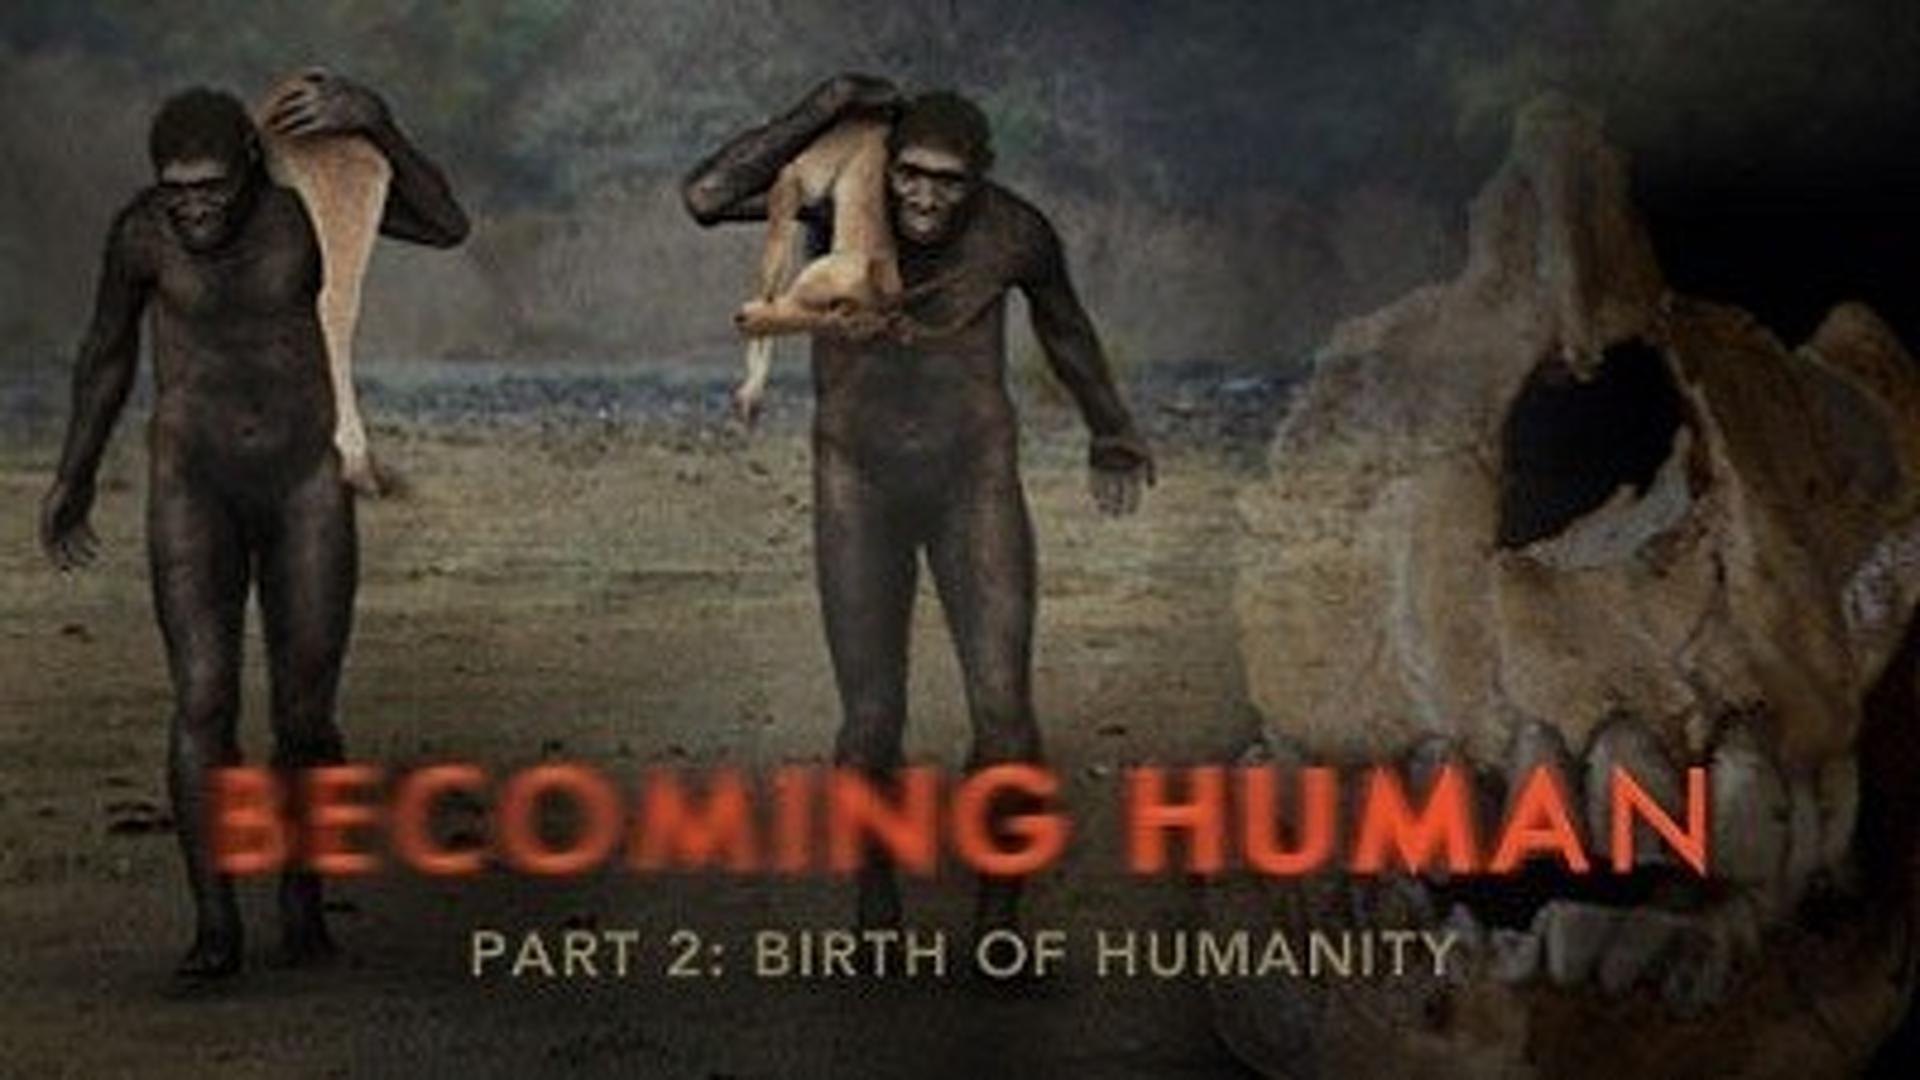 becoming human by nova